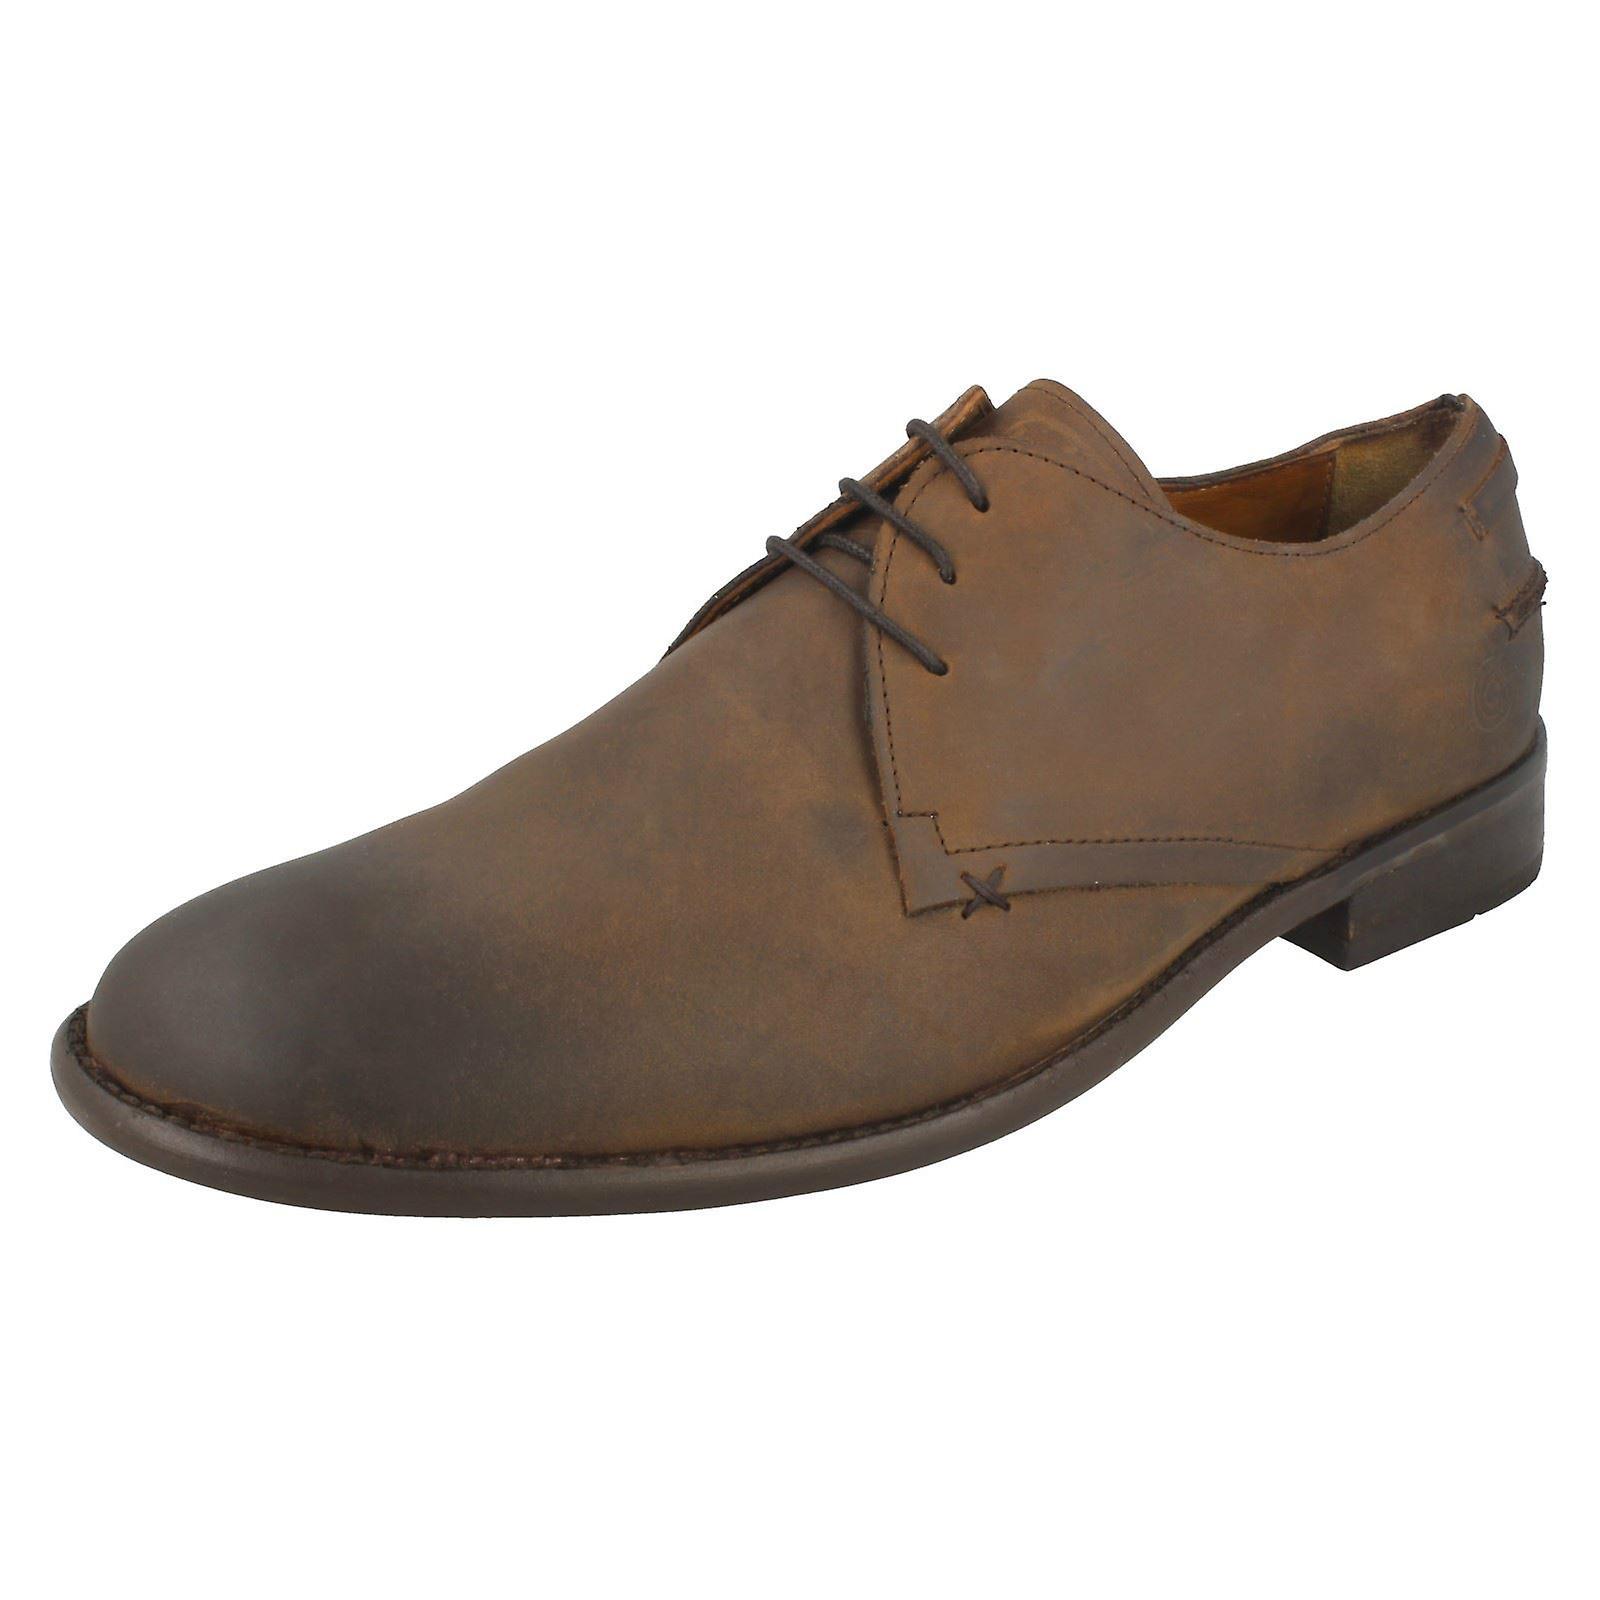 Mens Lambretta Brogue Stil Schuhe - Cuero Leder - UK Größe 10 - EU Größe 44 - US Größe 11